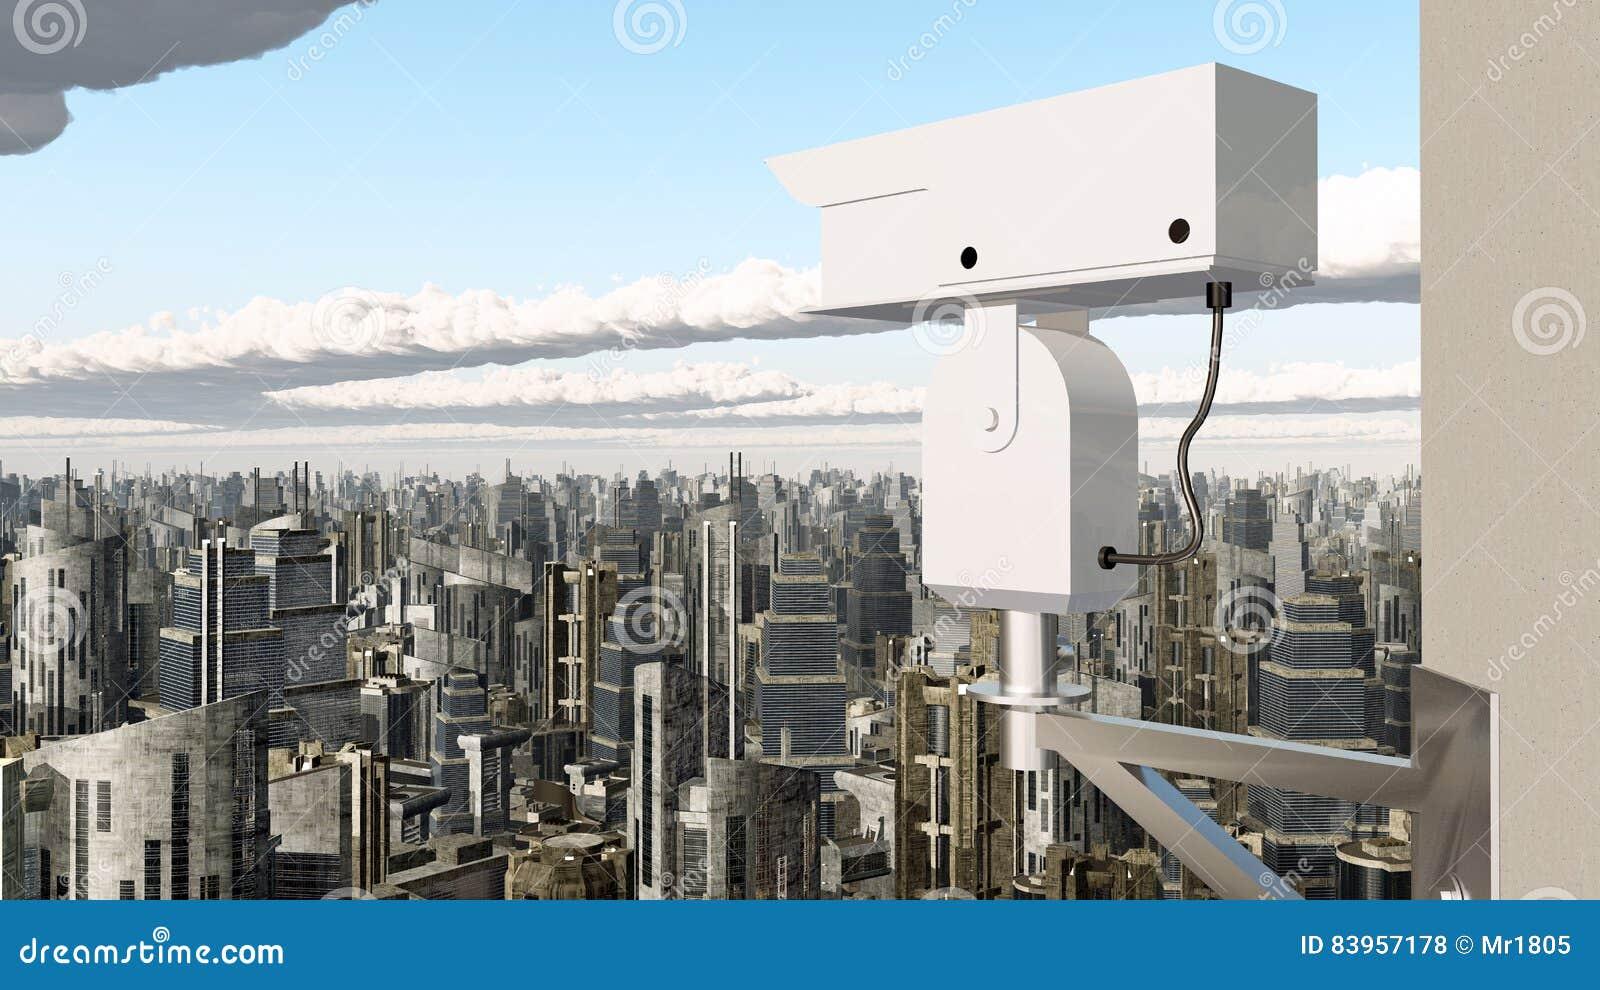 Surveillance Camera Over A City Stock Illustration - Illustration of